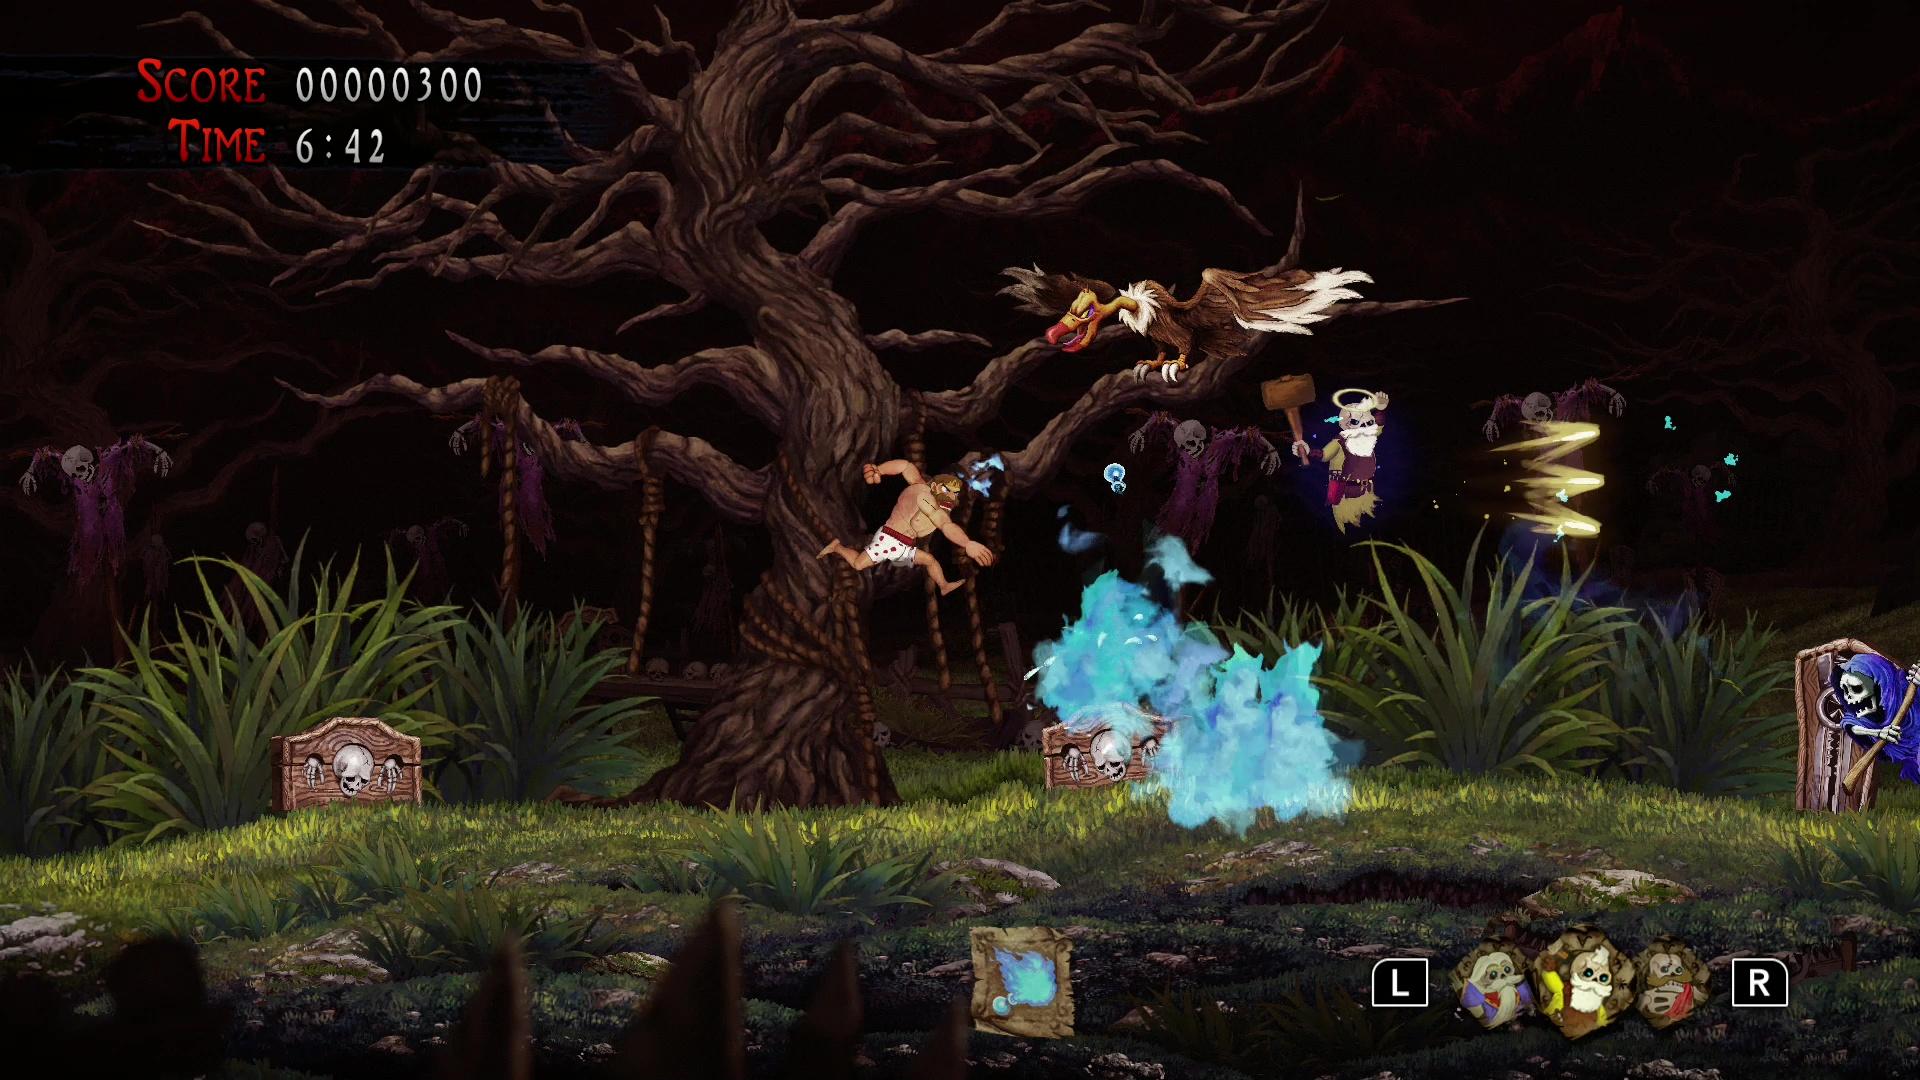 https://game.watch.impress.co.jp/img/gmw/docs/1308/344/25.jpg